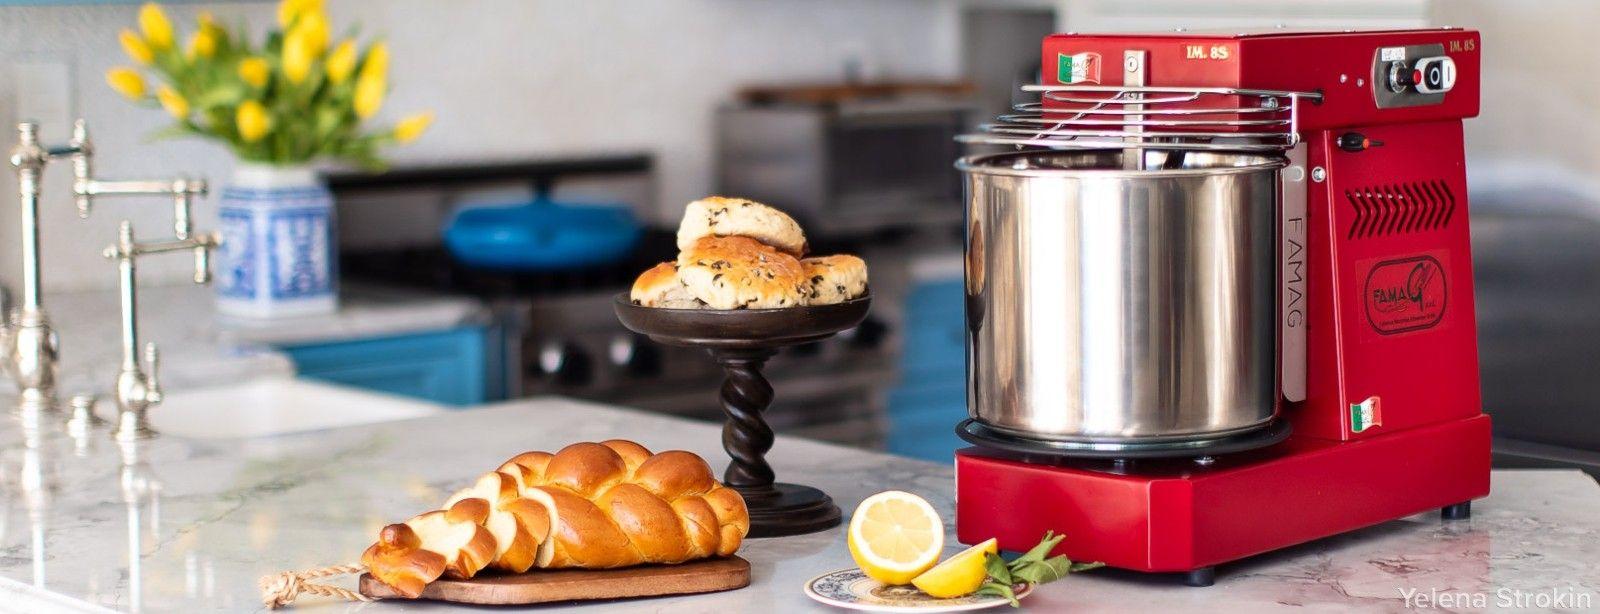 Famag spiral dough mixer